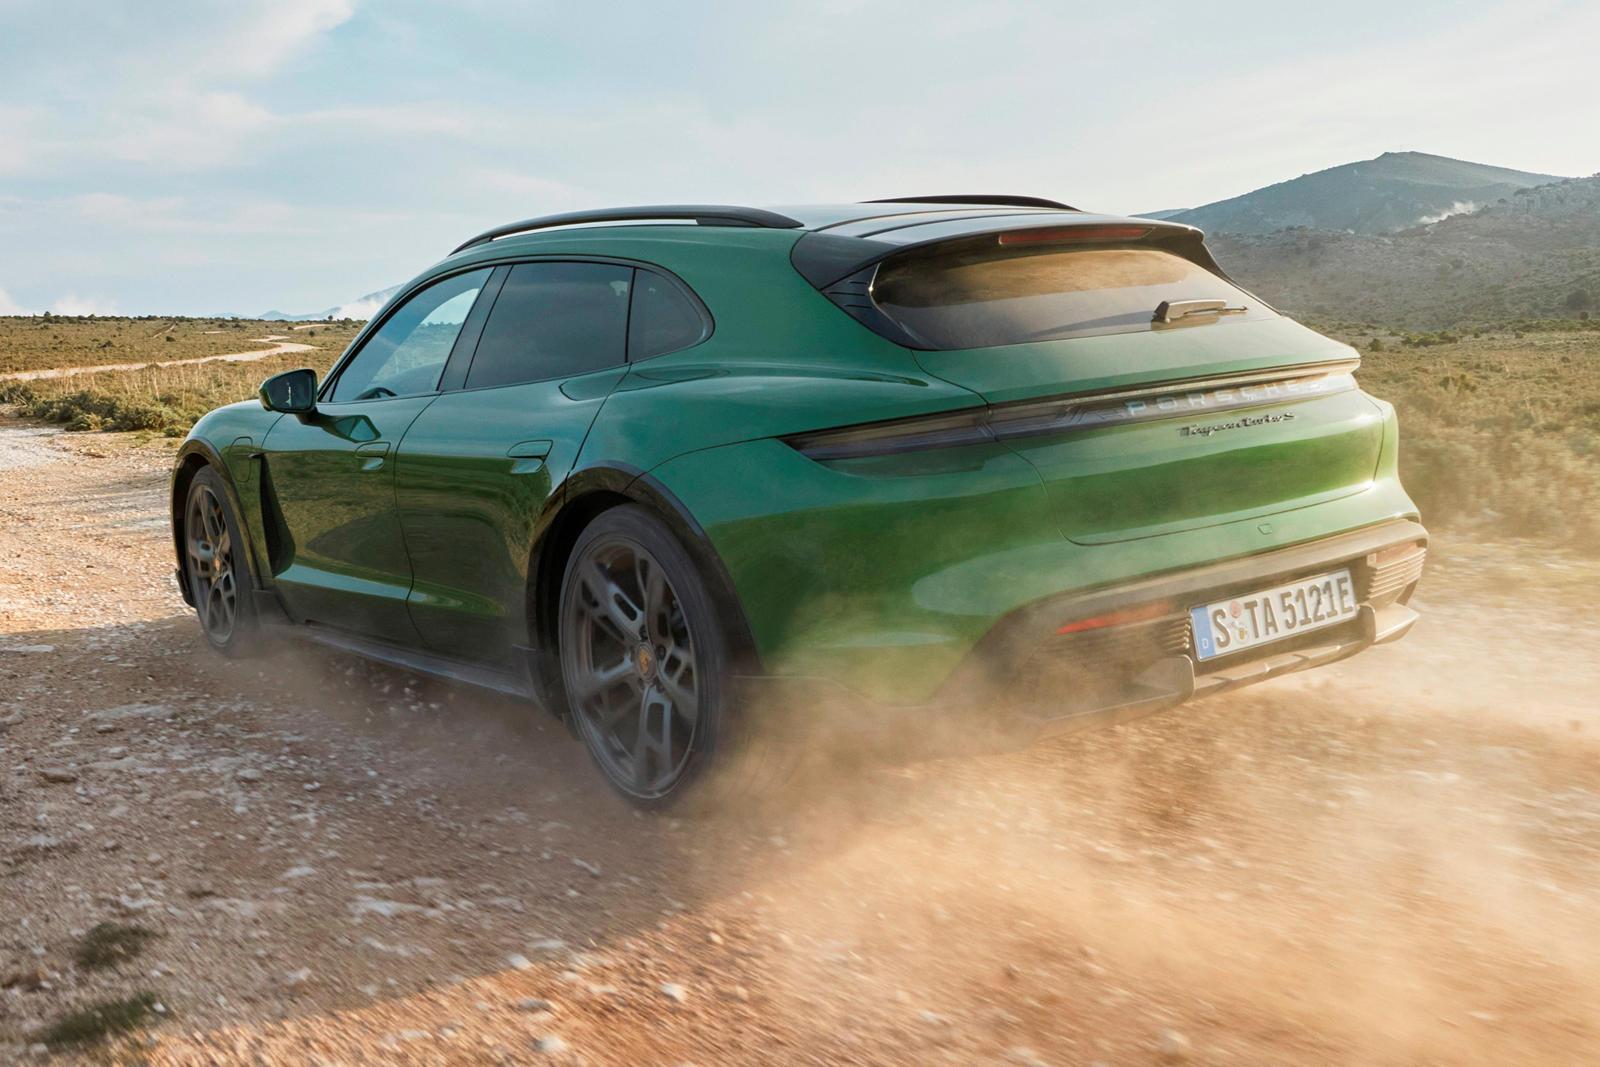 2021 Porsche Taycan Cross Turismo Is An Electric Sport Rally Car